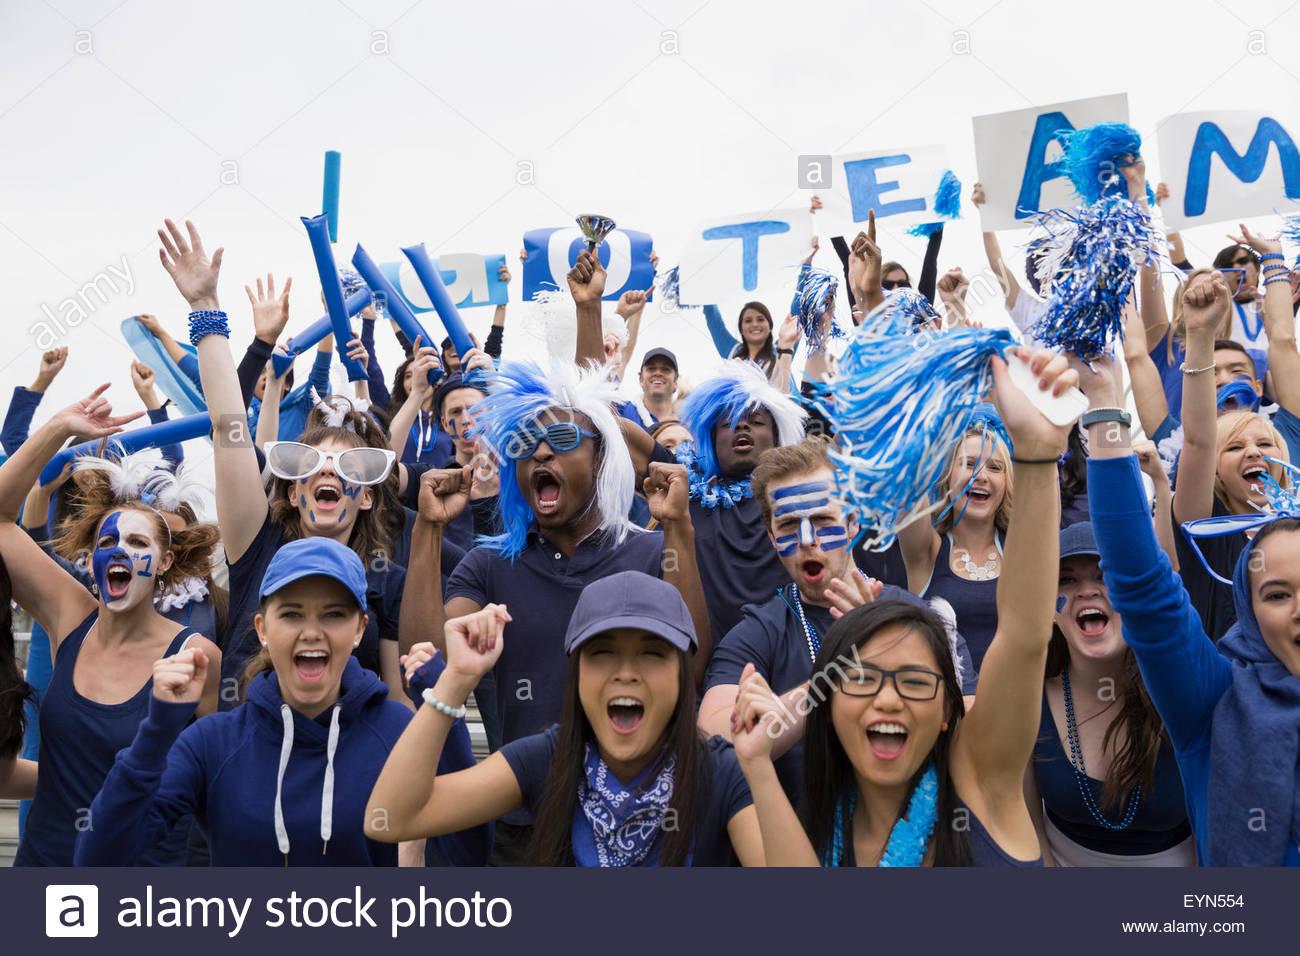 Porträt begeistertes Publikum in blau jubeln Sport-event Stockbild